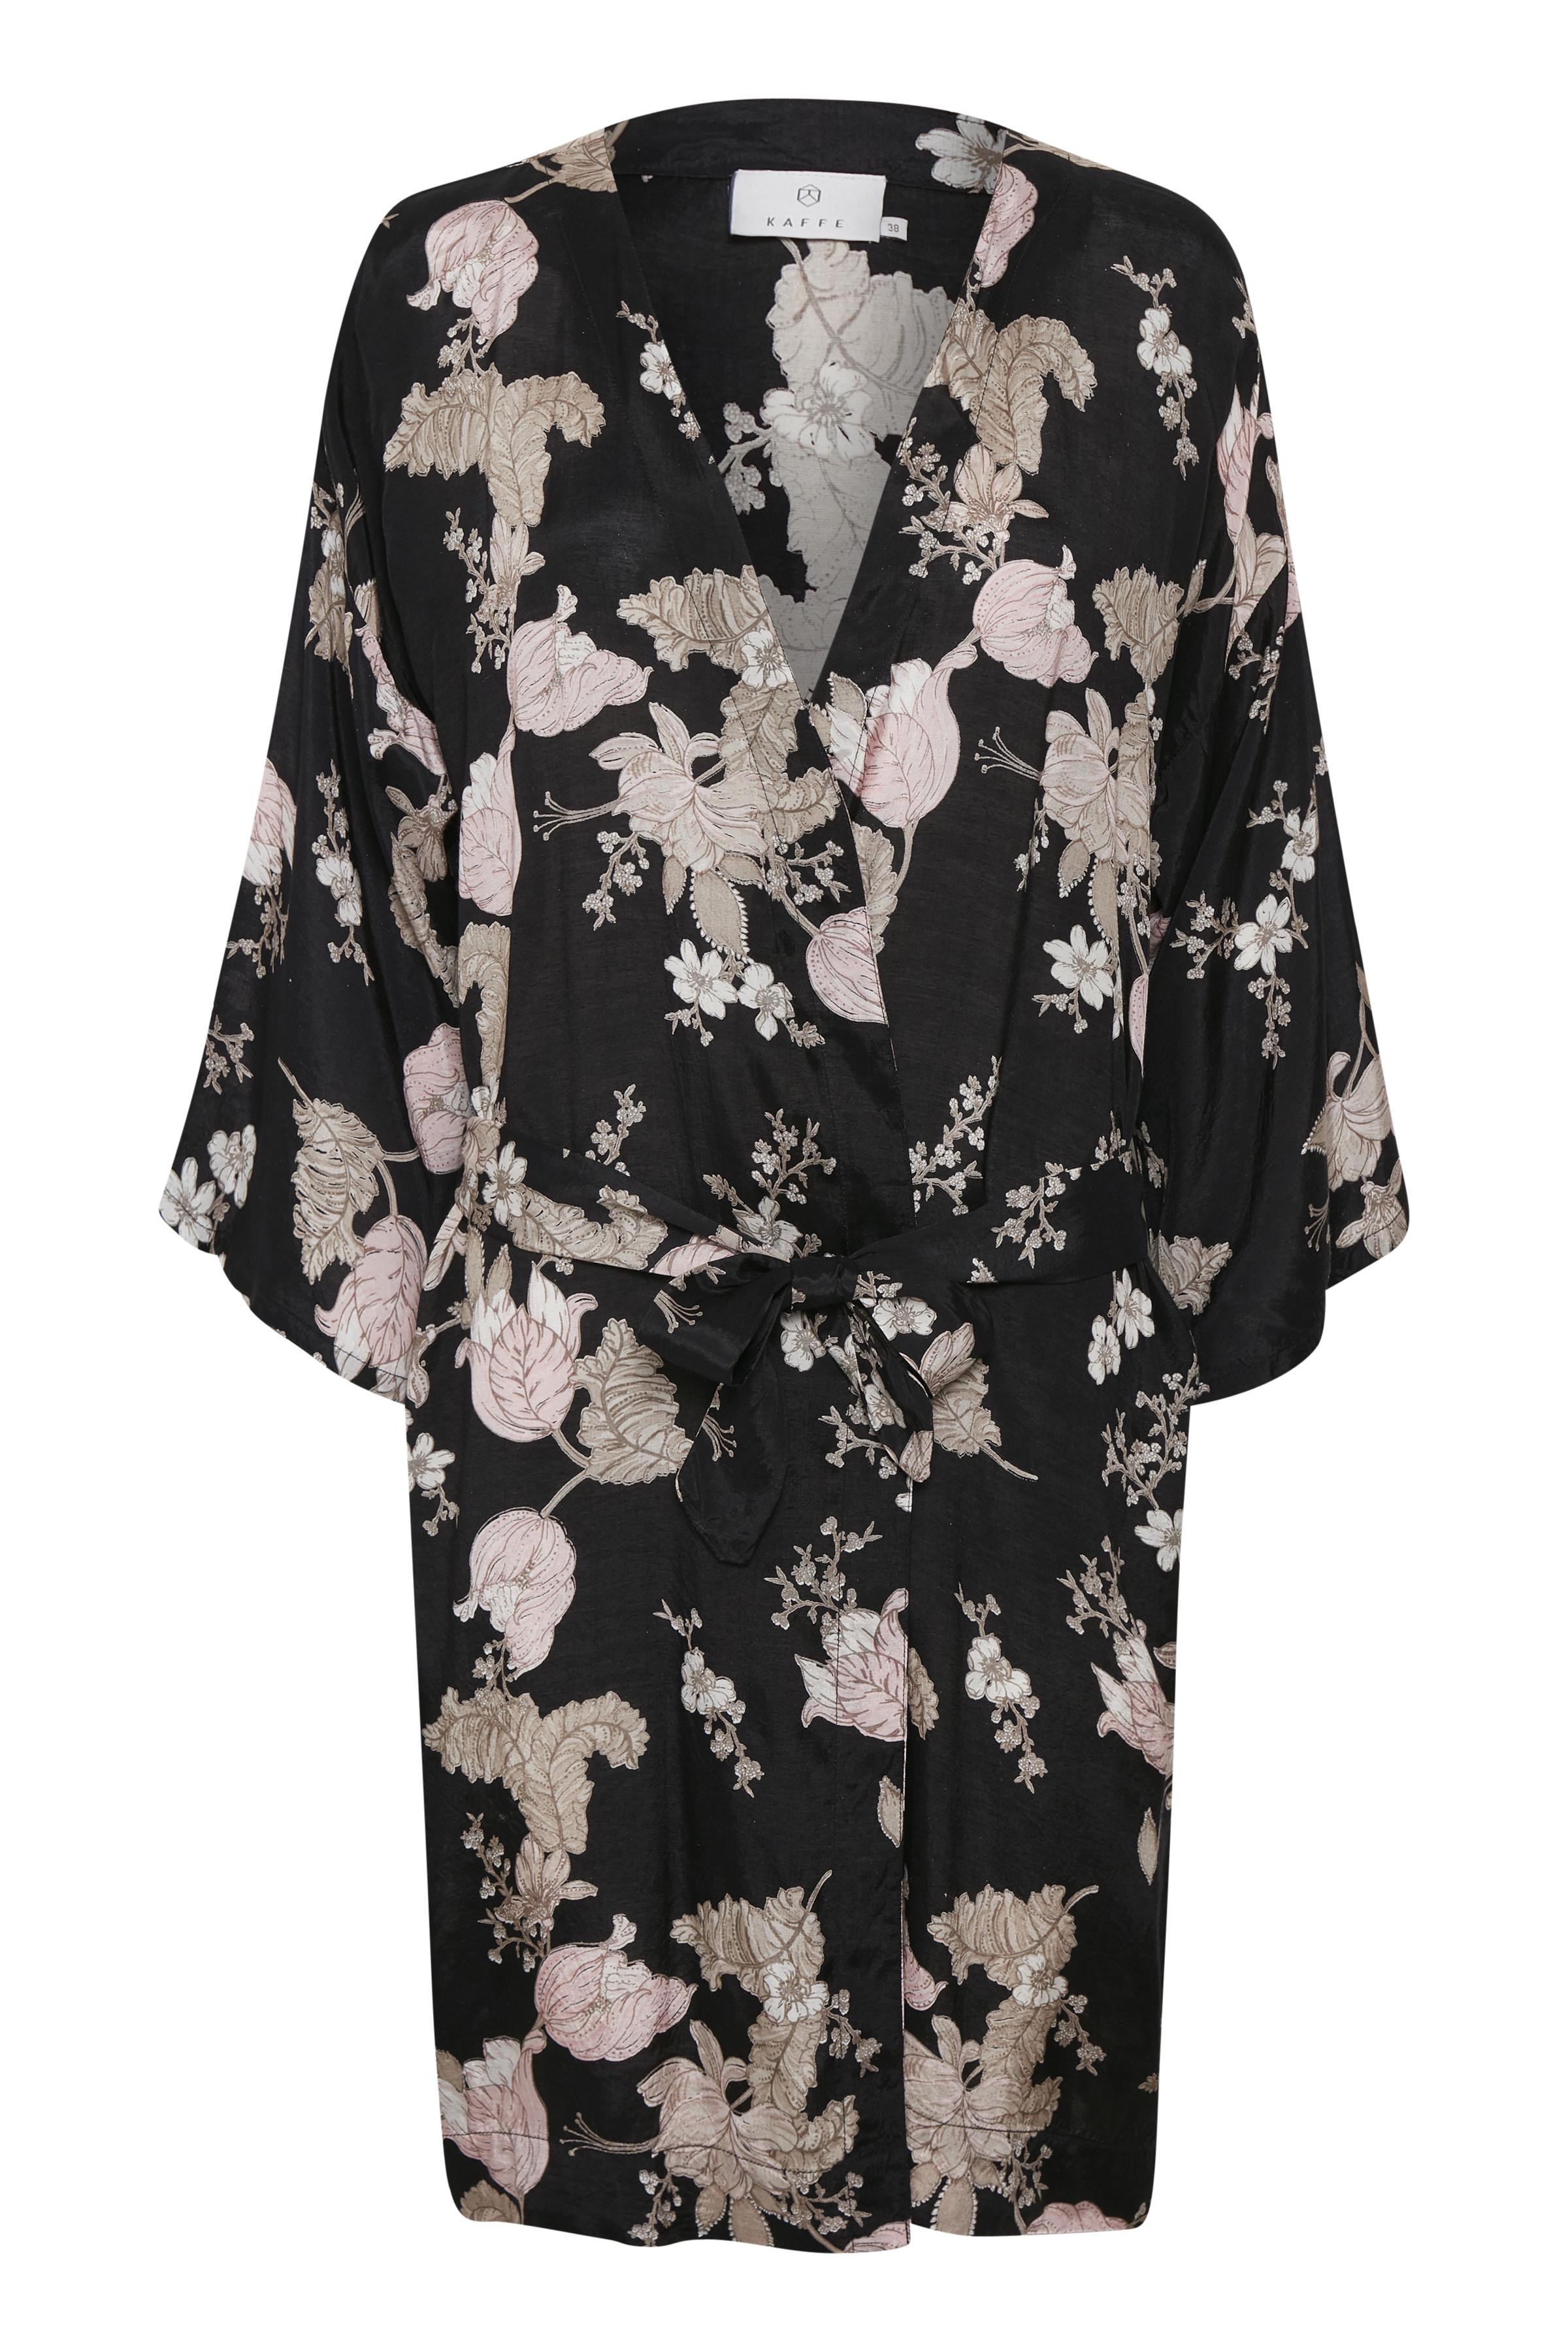 Zwart/lichtzand Kimono van Kaffe – Door Zwart/lichtzand Kimono van maat. 34-46 hier